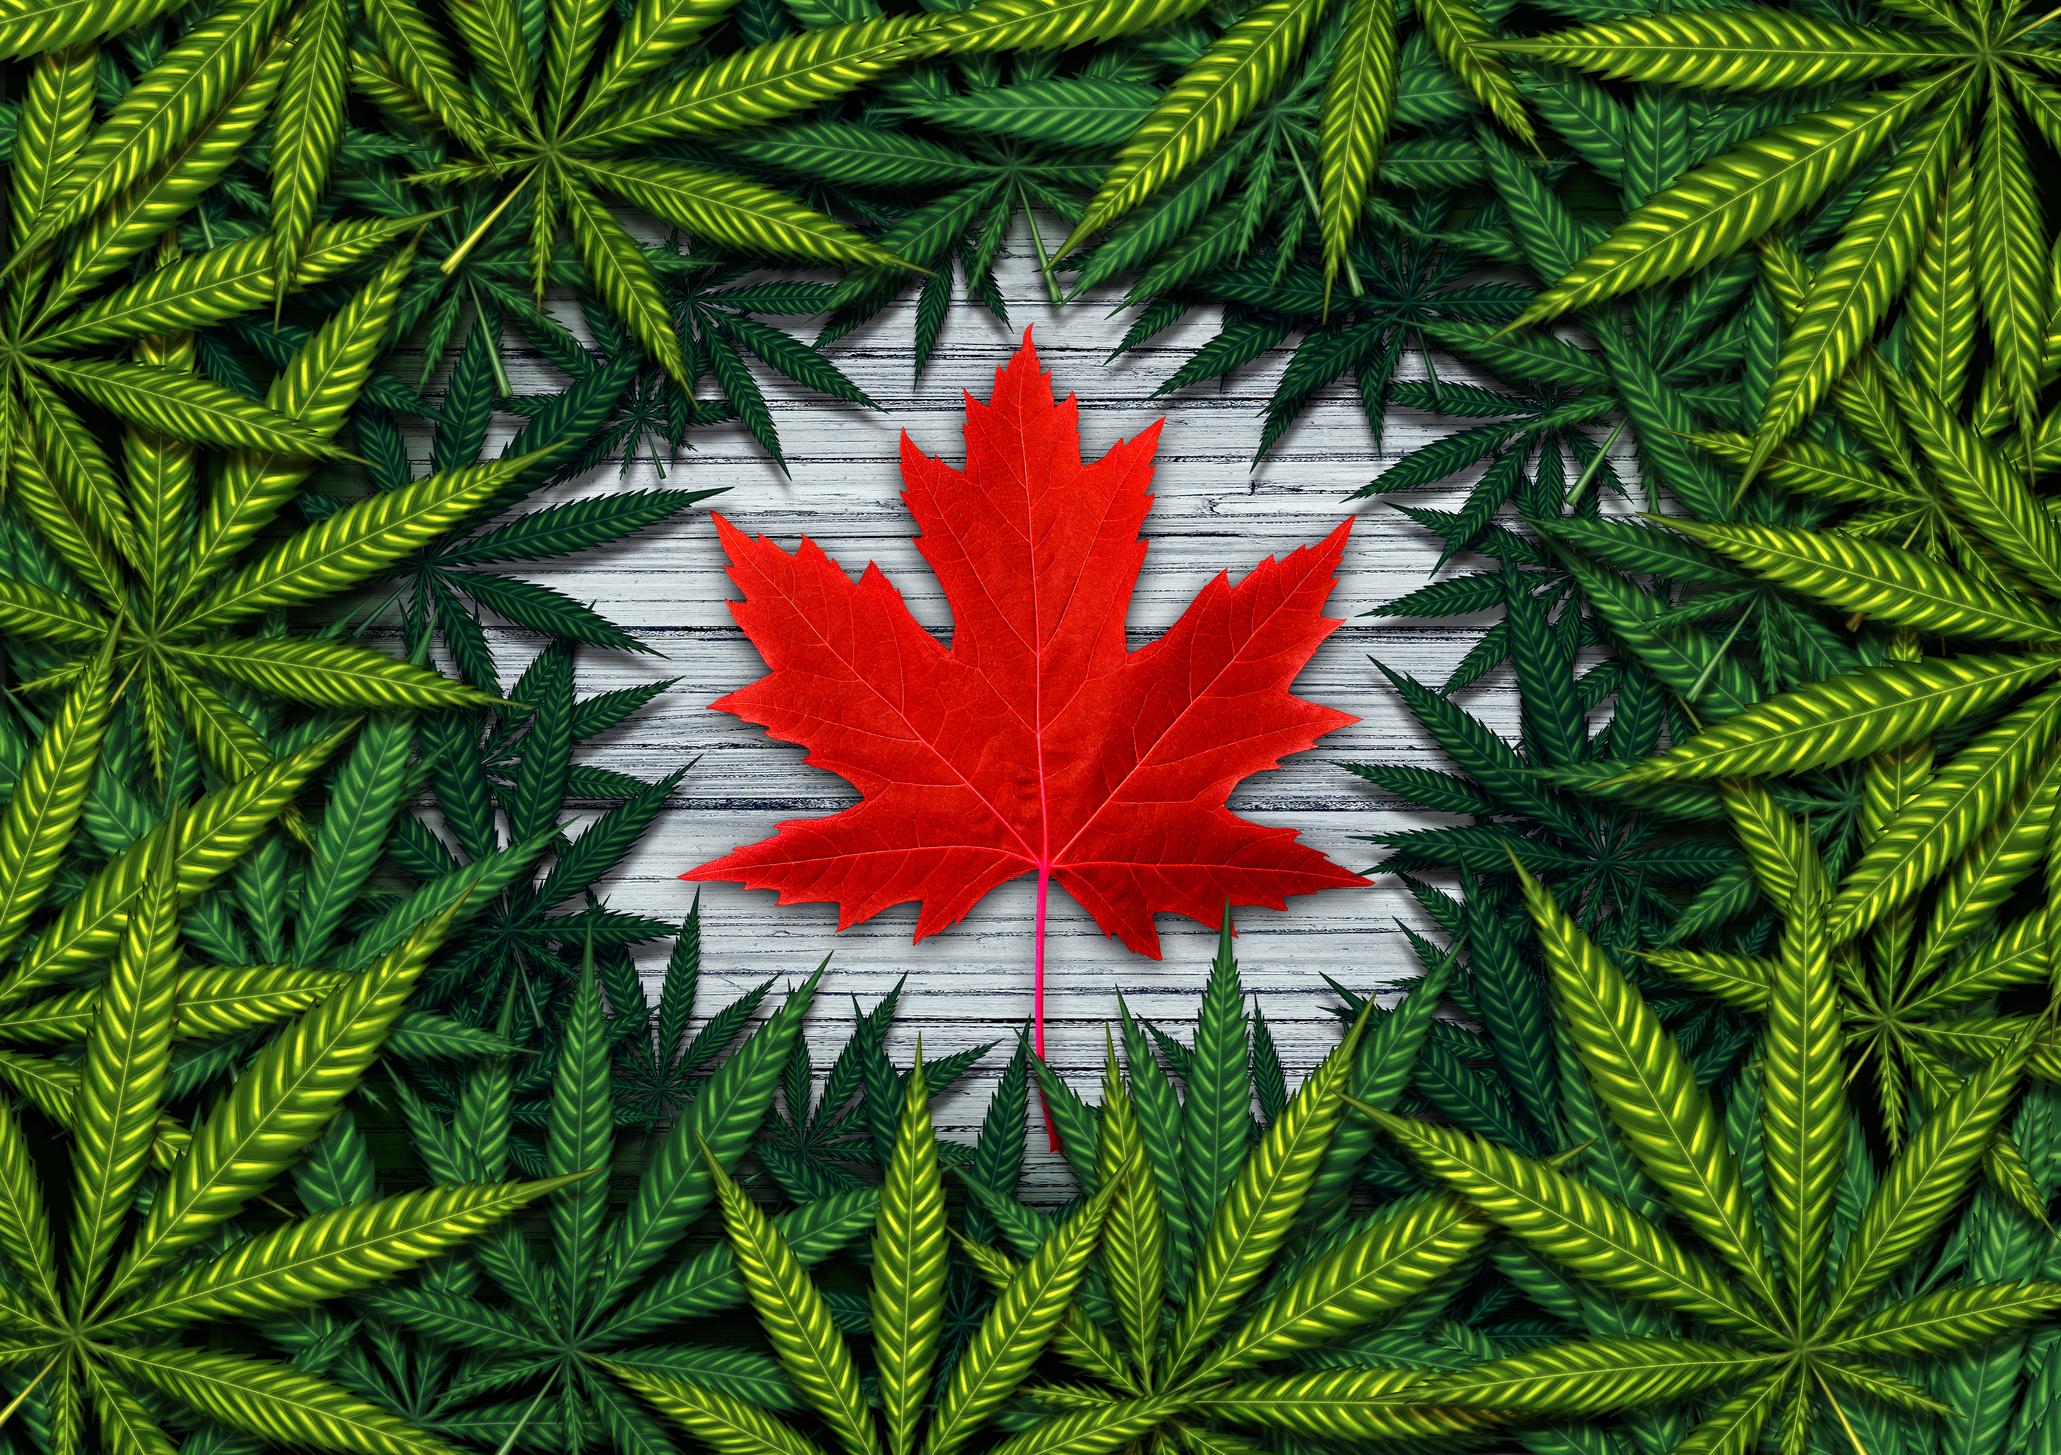 Red Canadian maple leaf framed by marijuana leaves.